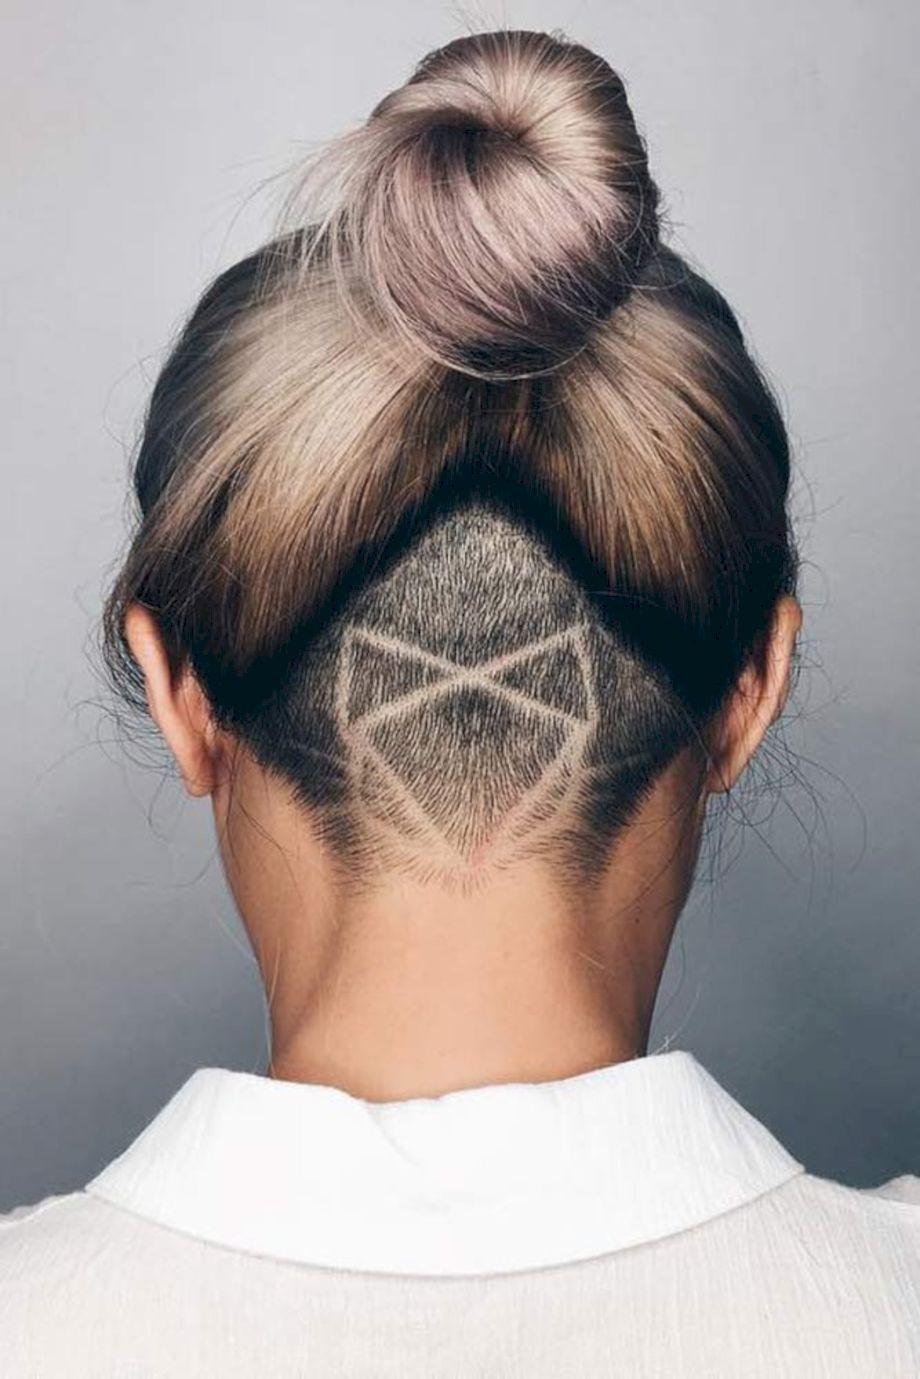 The New Hair Trend: Secret Undercut Hair Tattoos